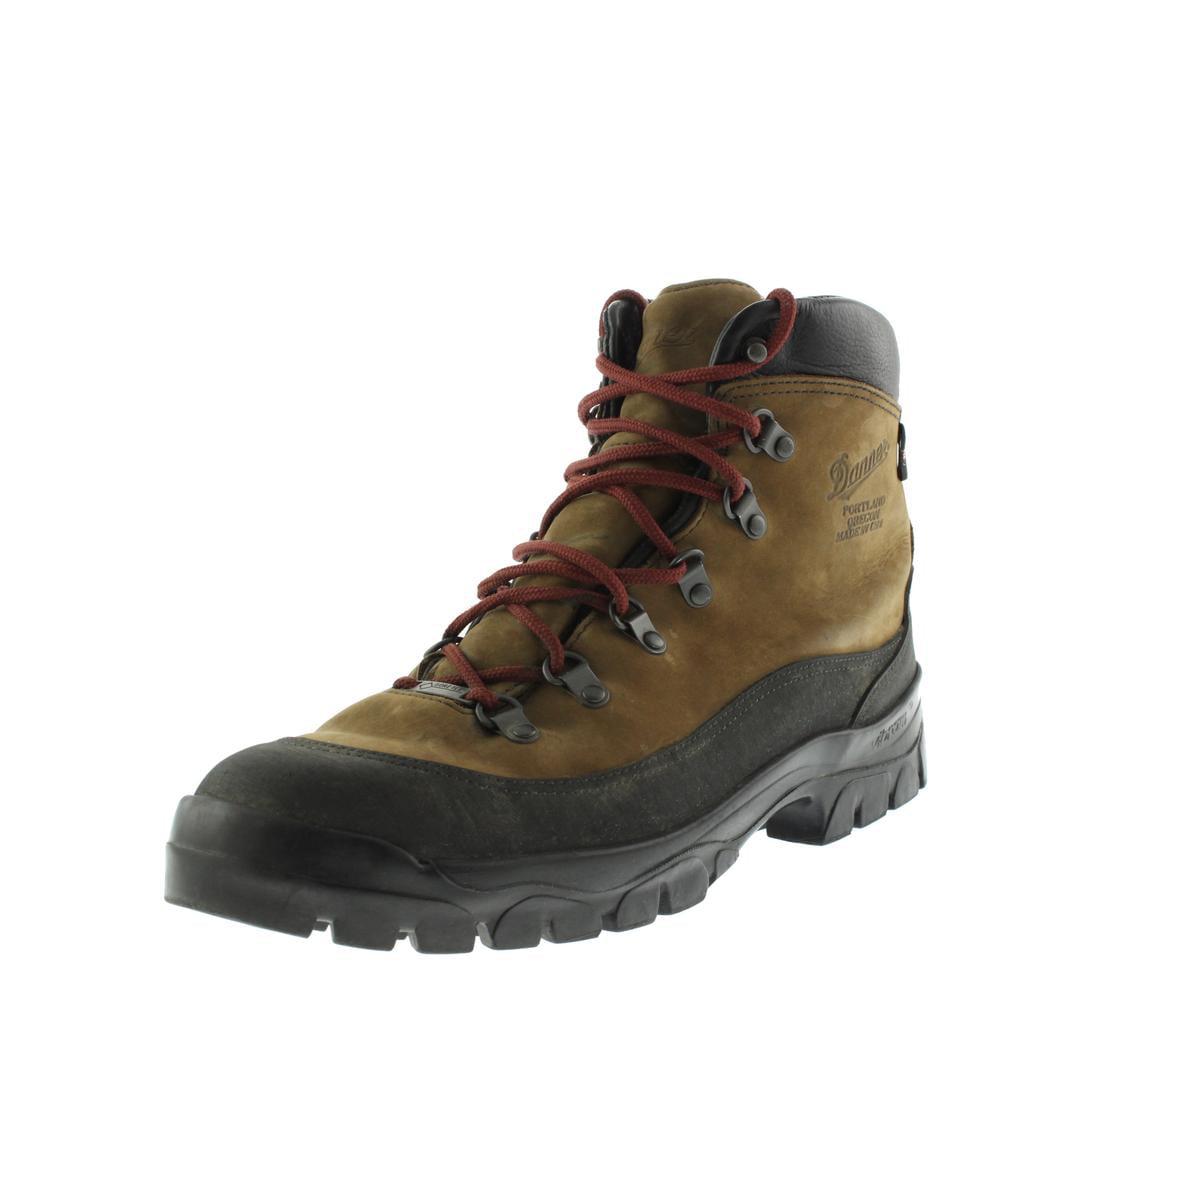 Danner Men Crater Rim 6' Hiking Boots by Danner